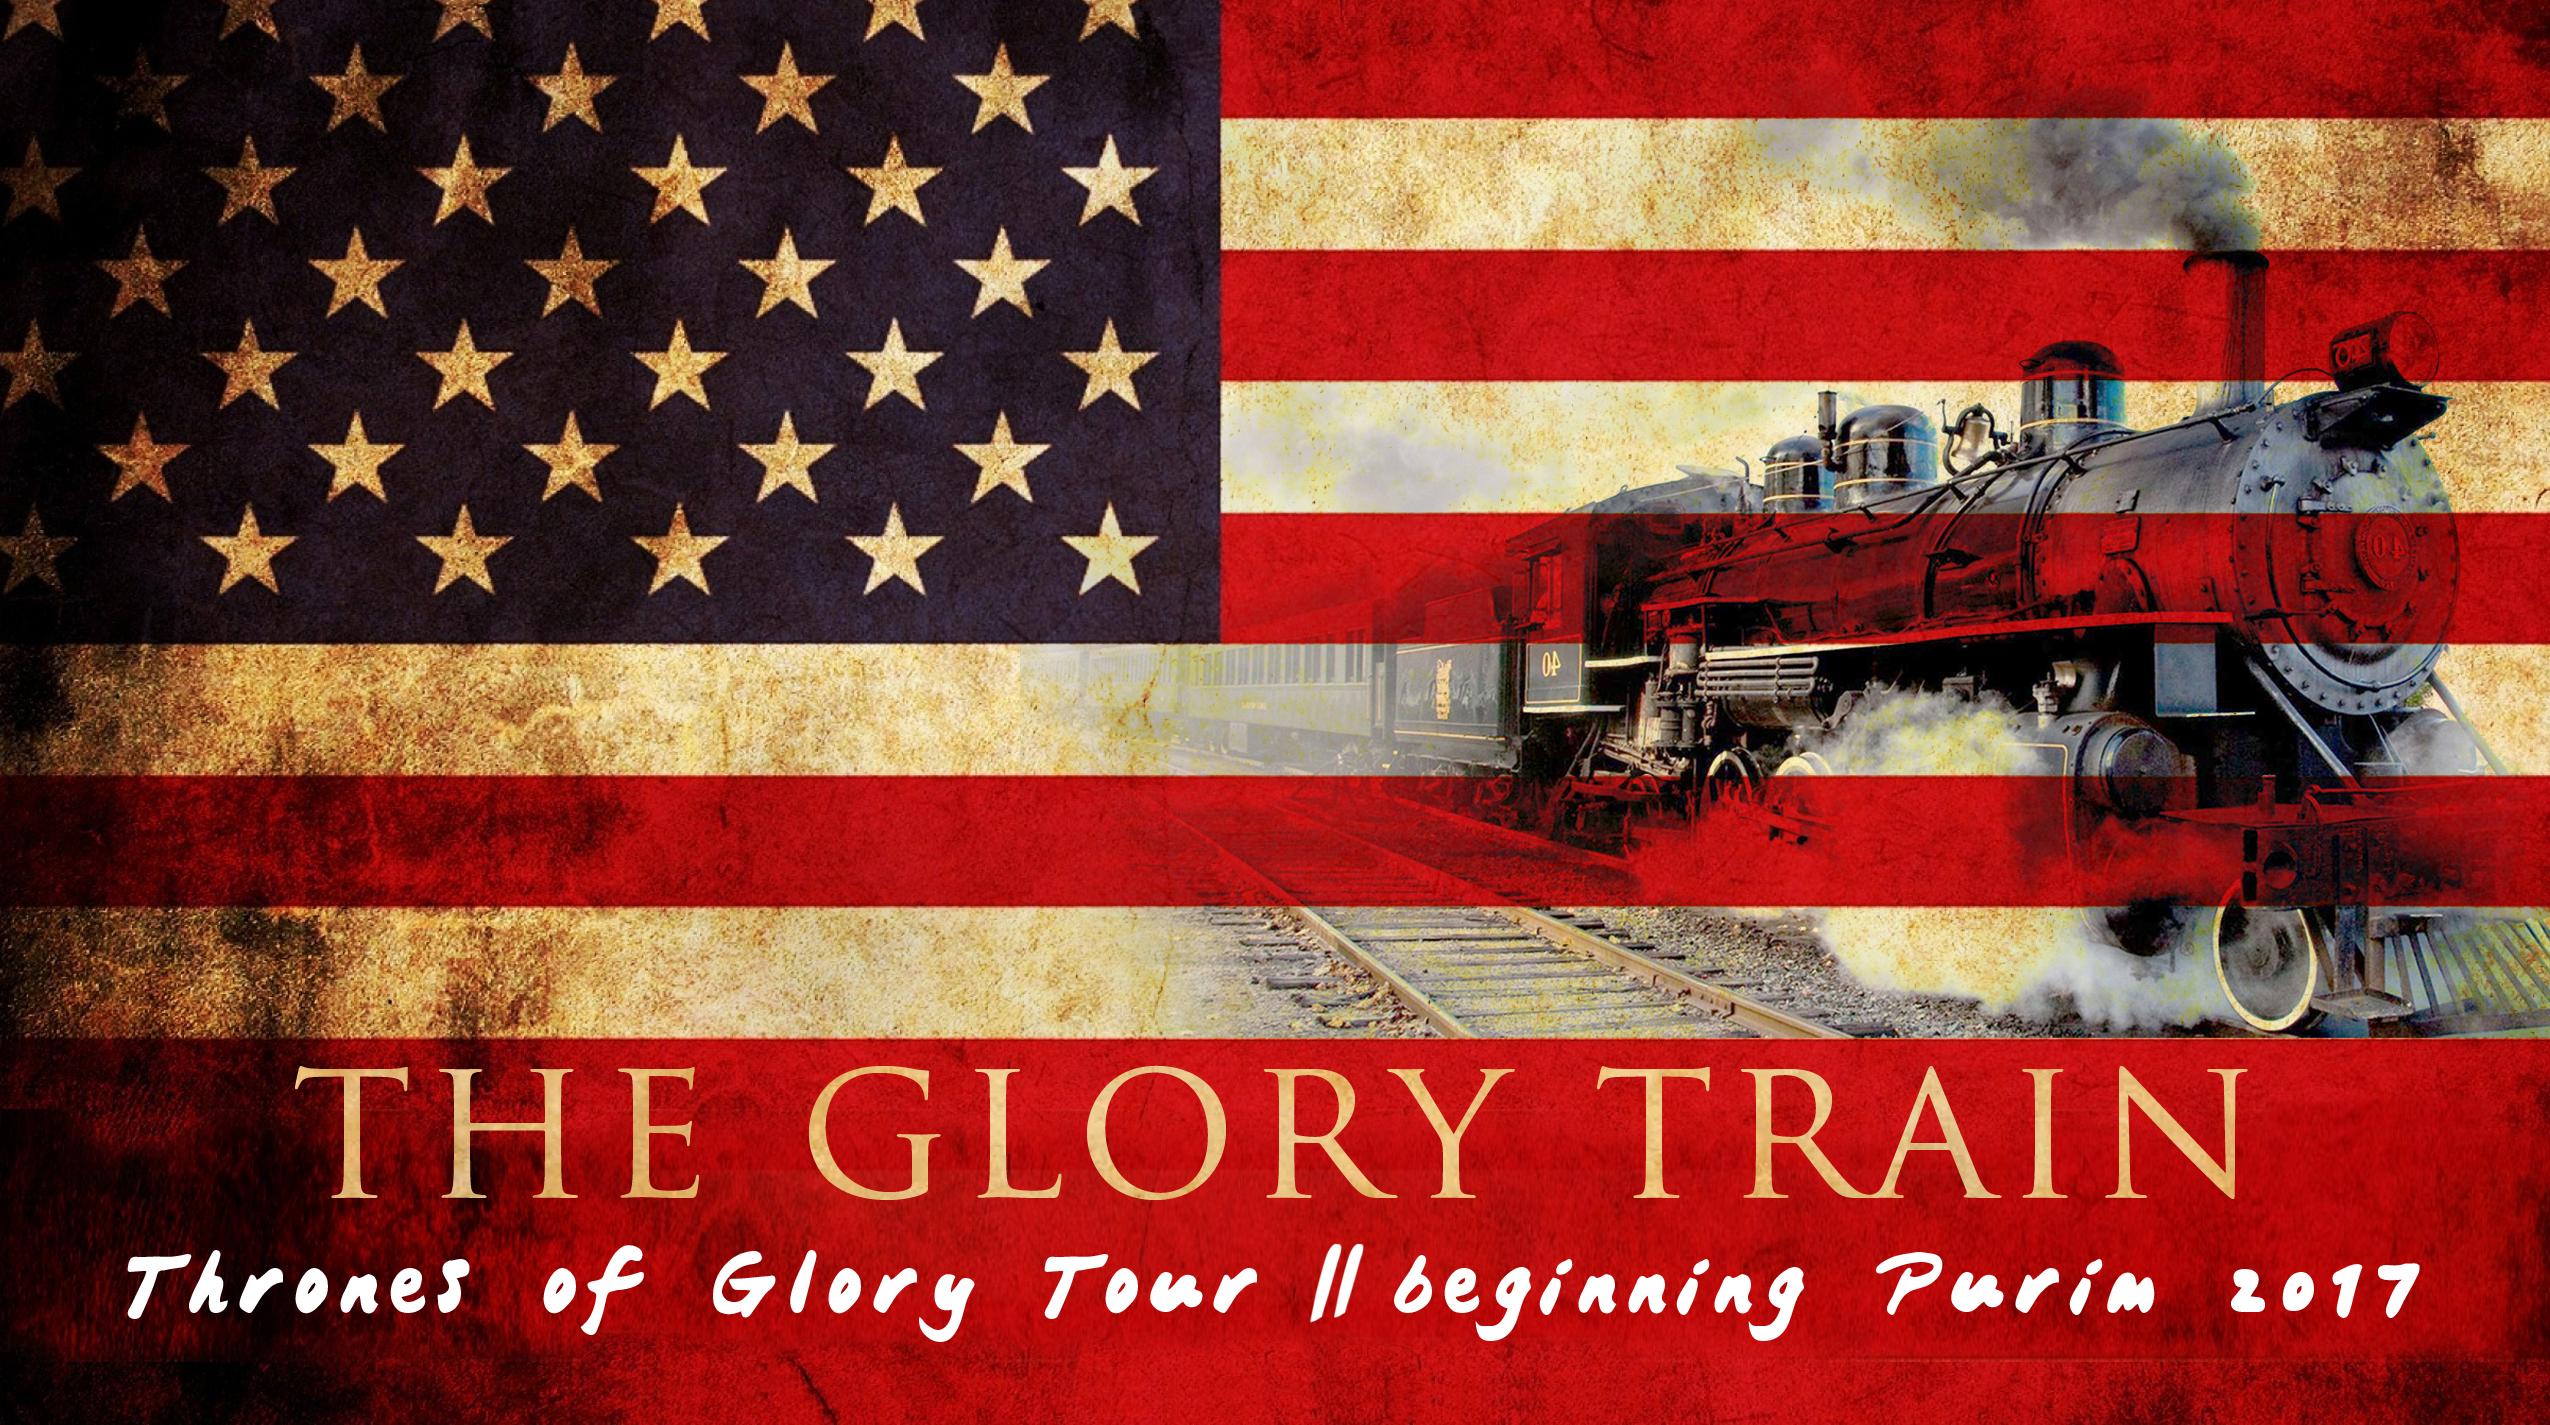 DV Glory Train—Thrones of Glory Tour Purim